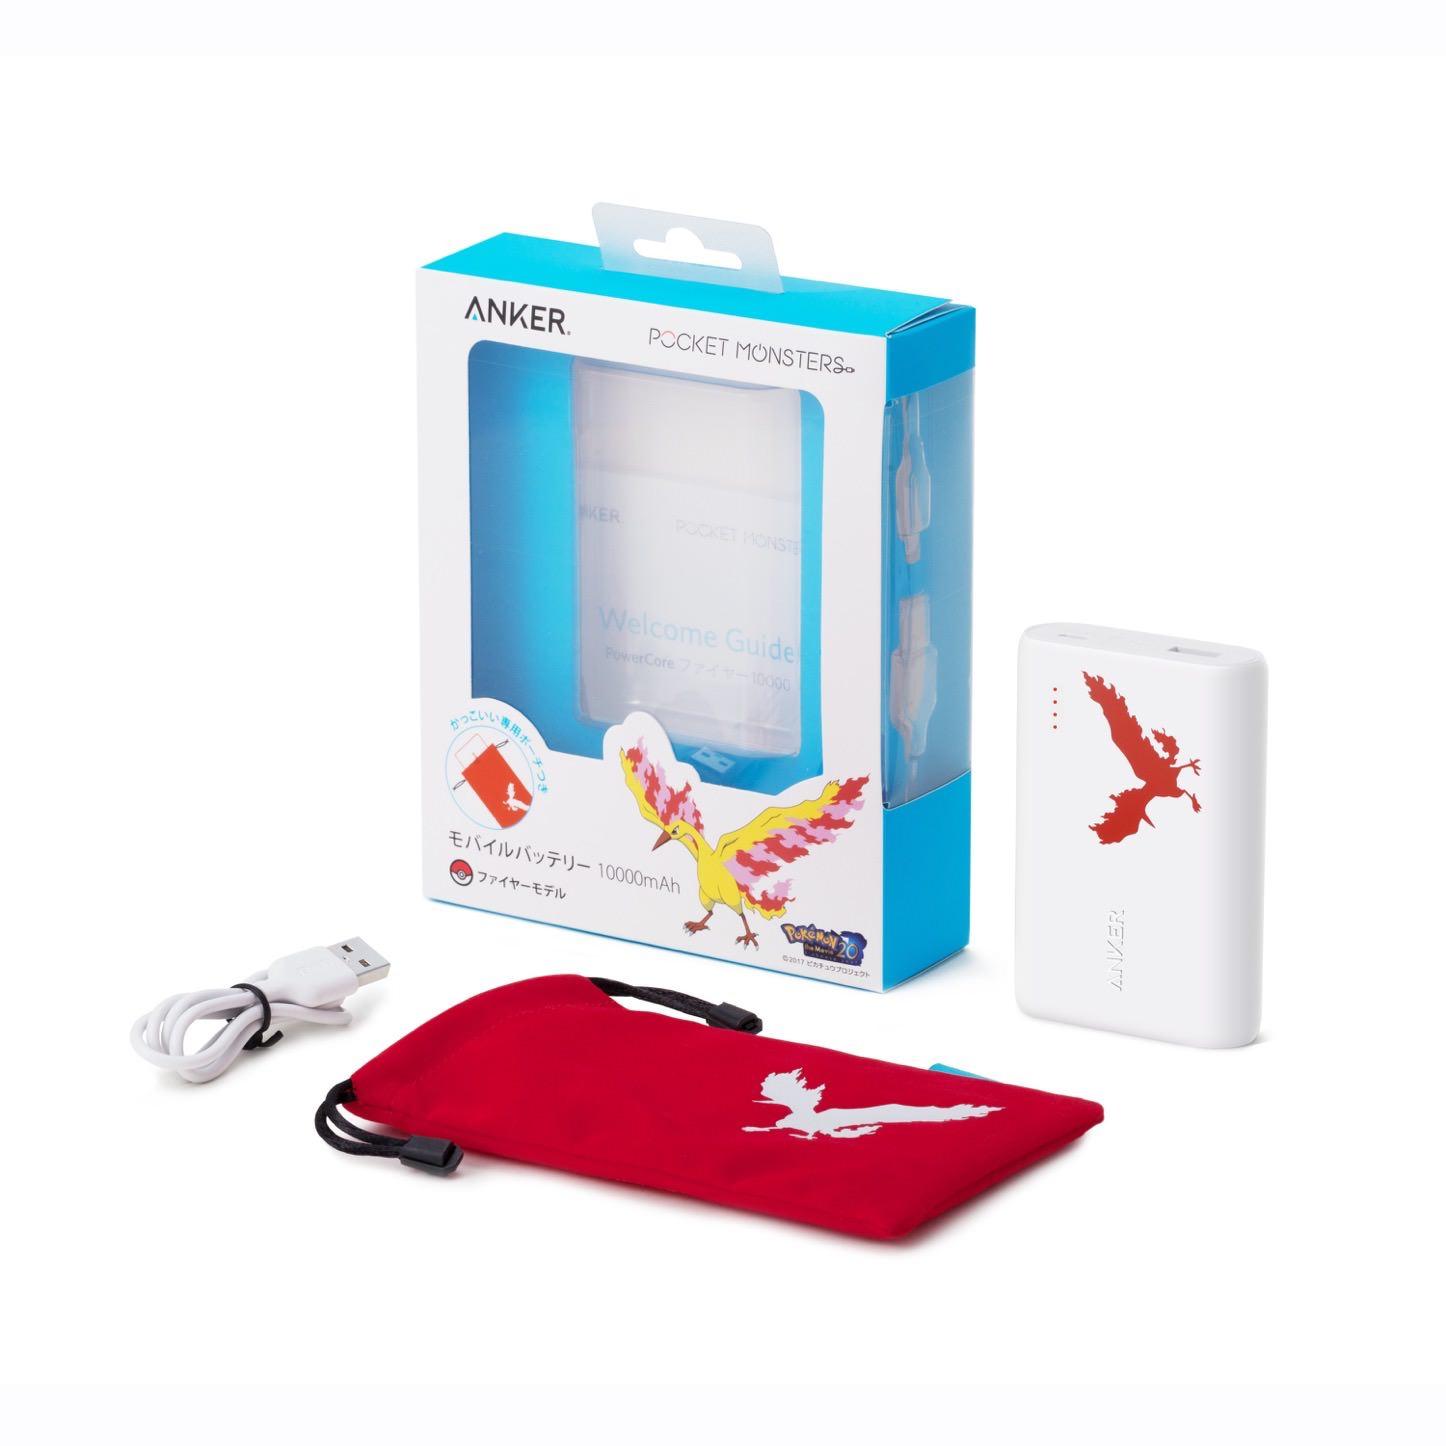 Anker-Pokemon-Mobile-Accessories-02.jpg